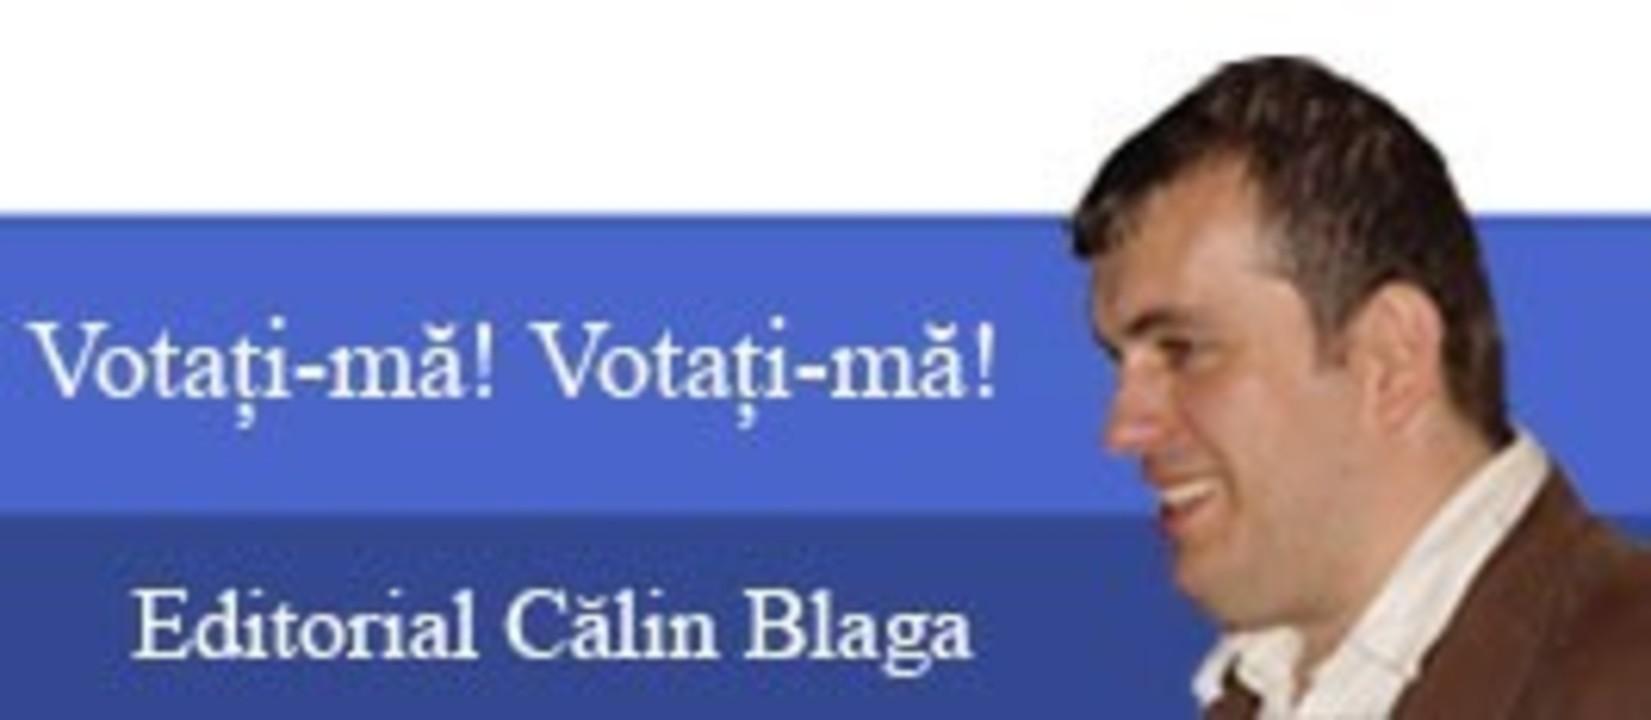 Votati-ma! Votati-ma!